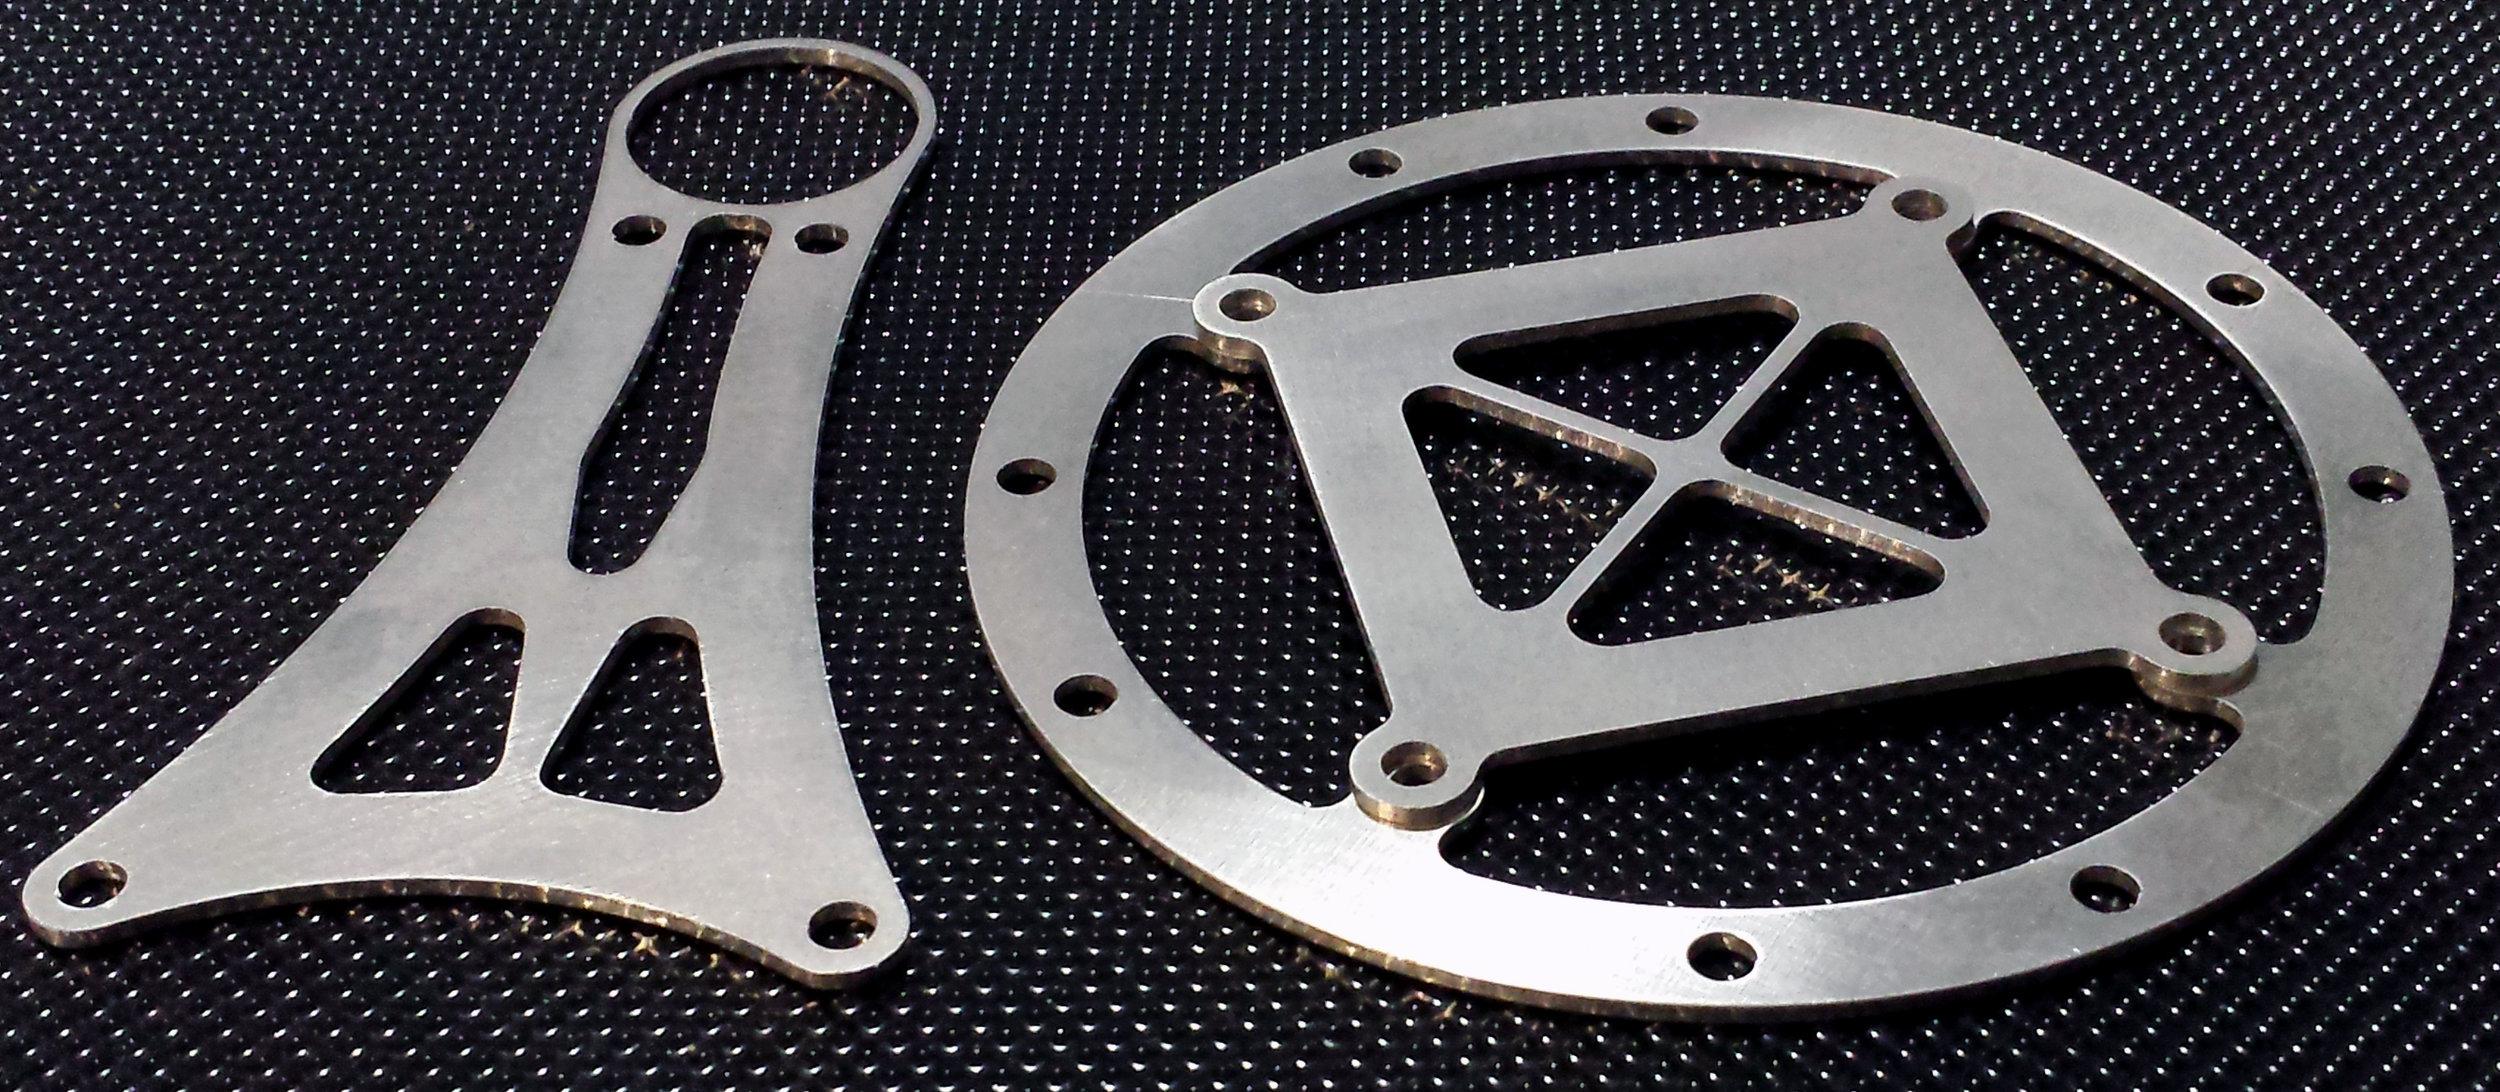 CNC Machining & Laser Cutting -